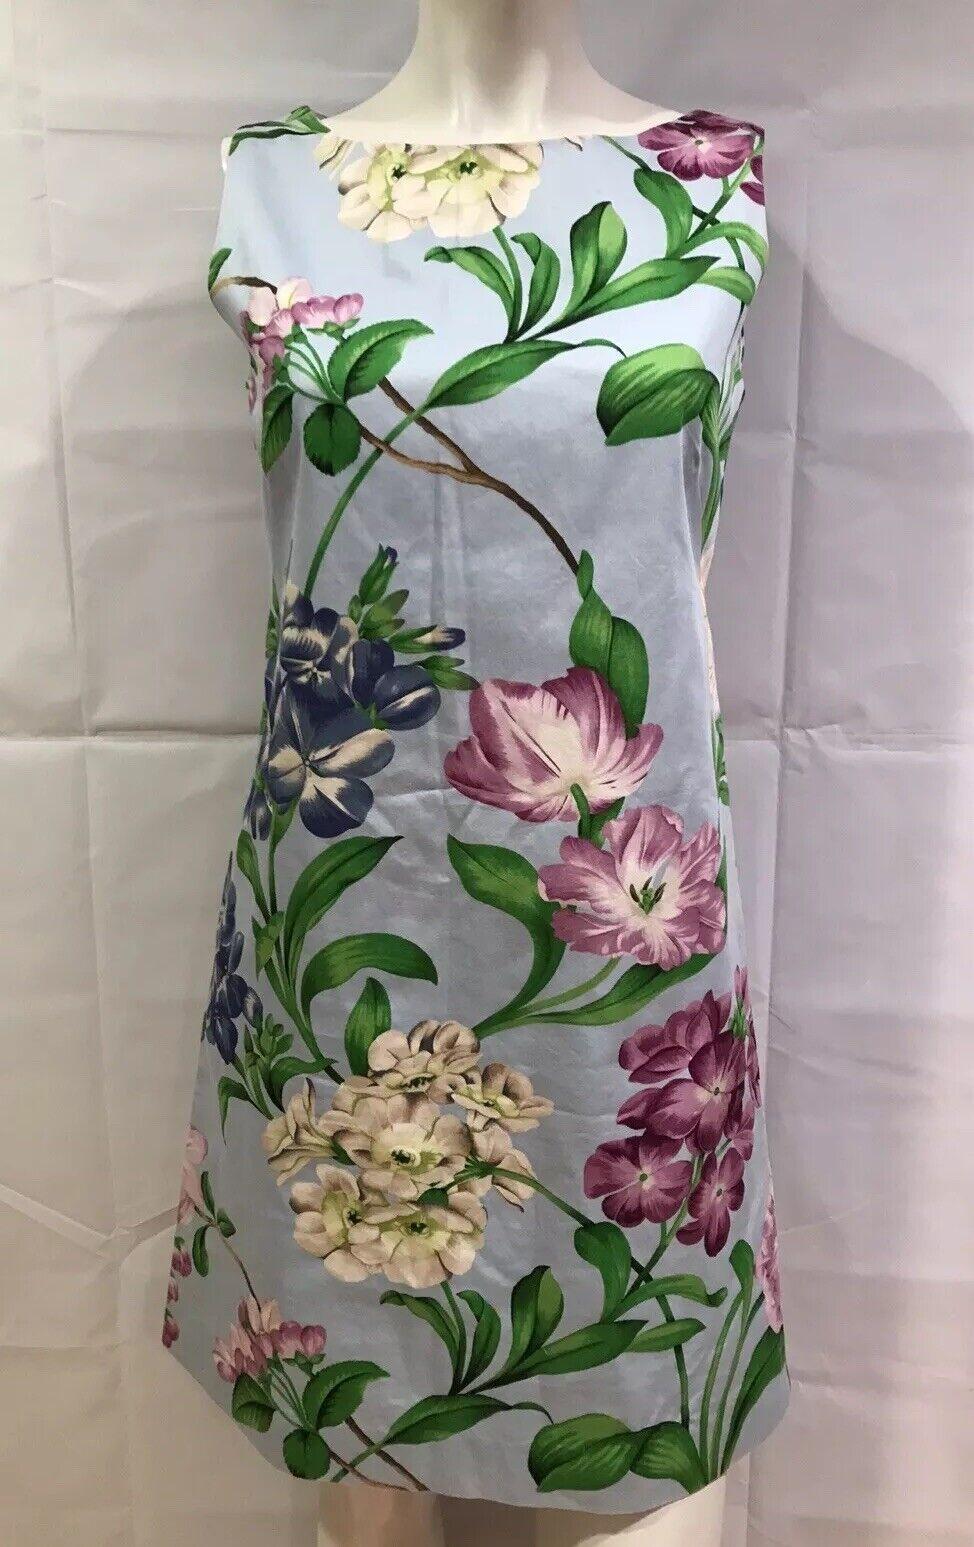 Steven Stolman 8 Dress Sheath Blau Flowers Print Sleeveless Cotton Lining Größe 8